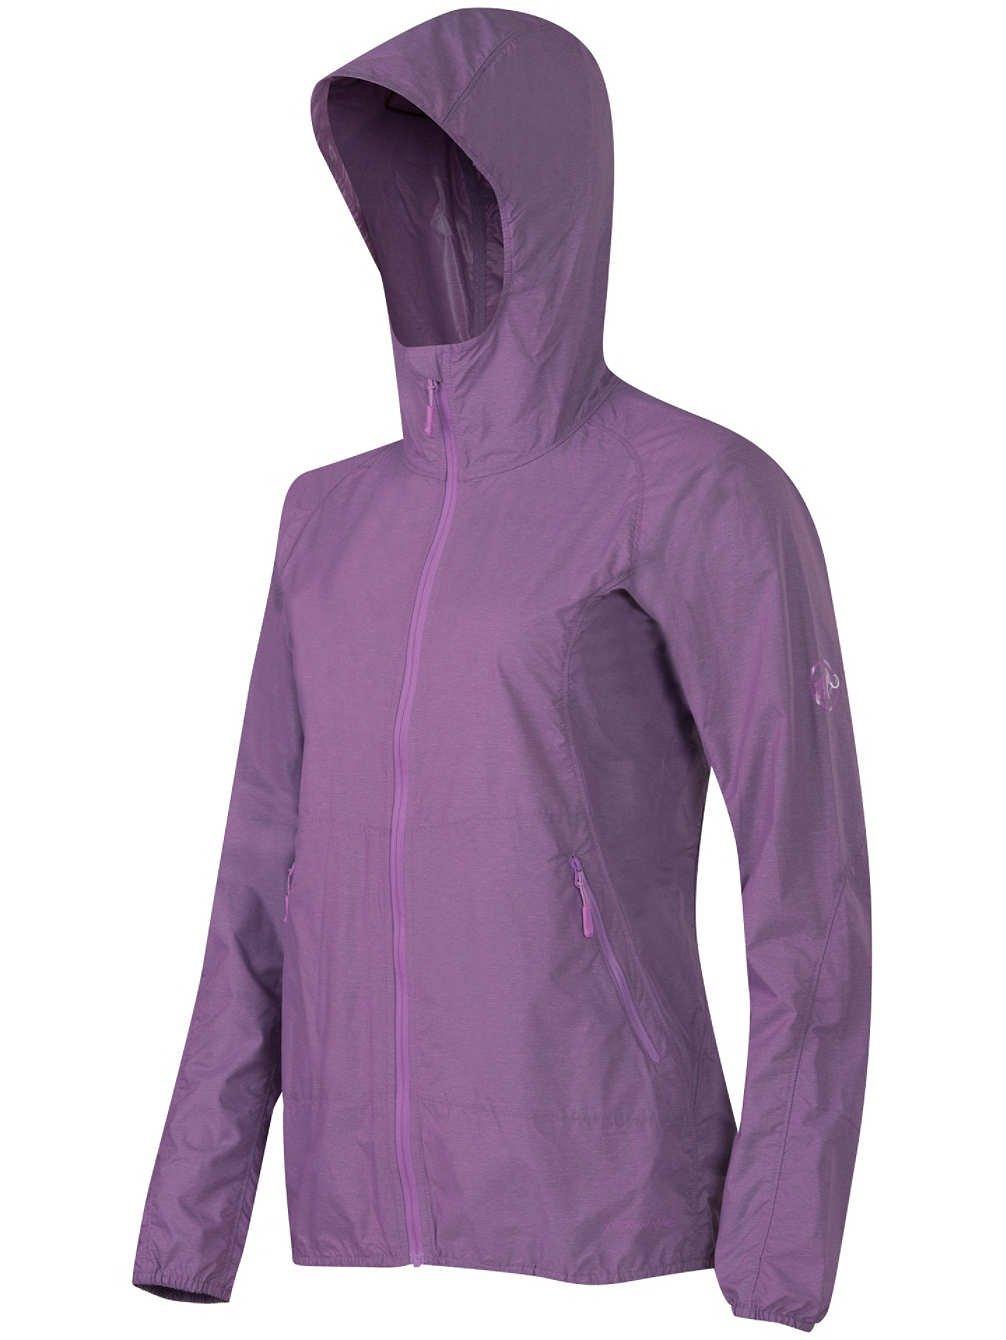 Mammut Zephira WB Hooded Jacket Women (Softshell Jackets/Vests)